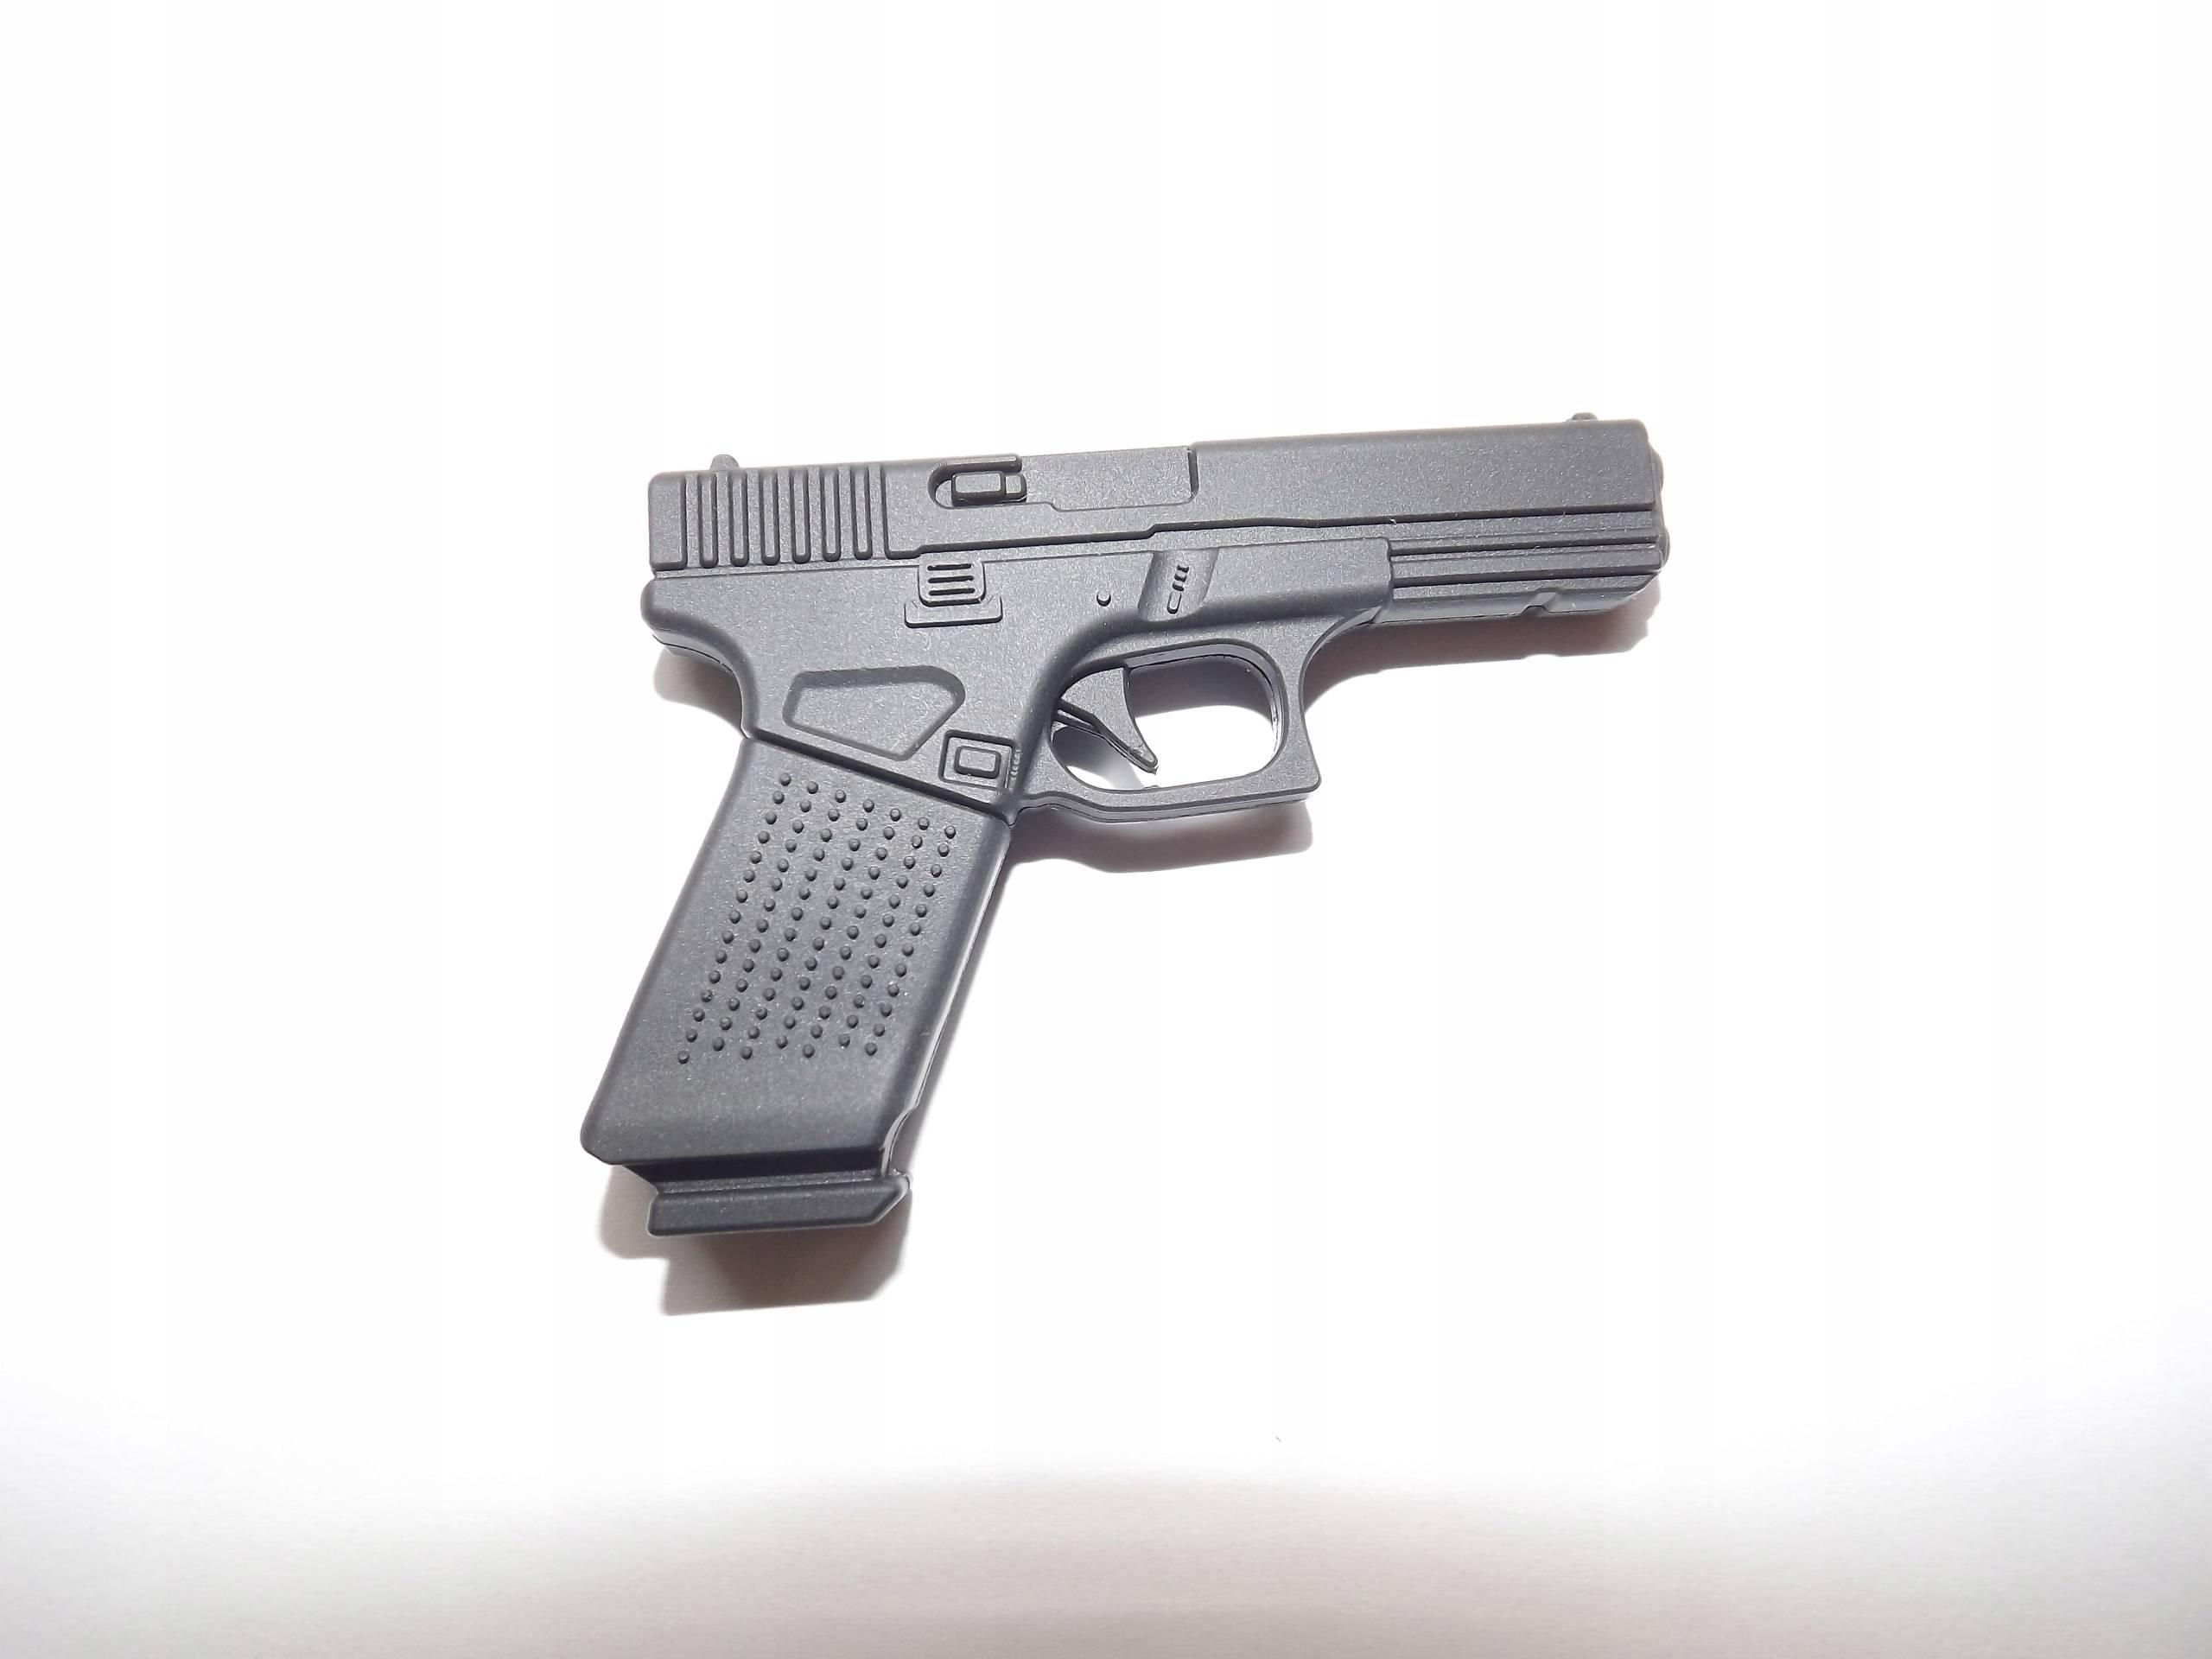 Пистолет glock 17 gen5 и 19 gen5 — характеристики, ттх, фото